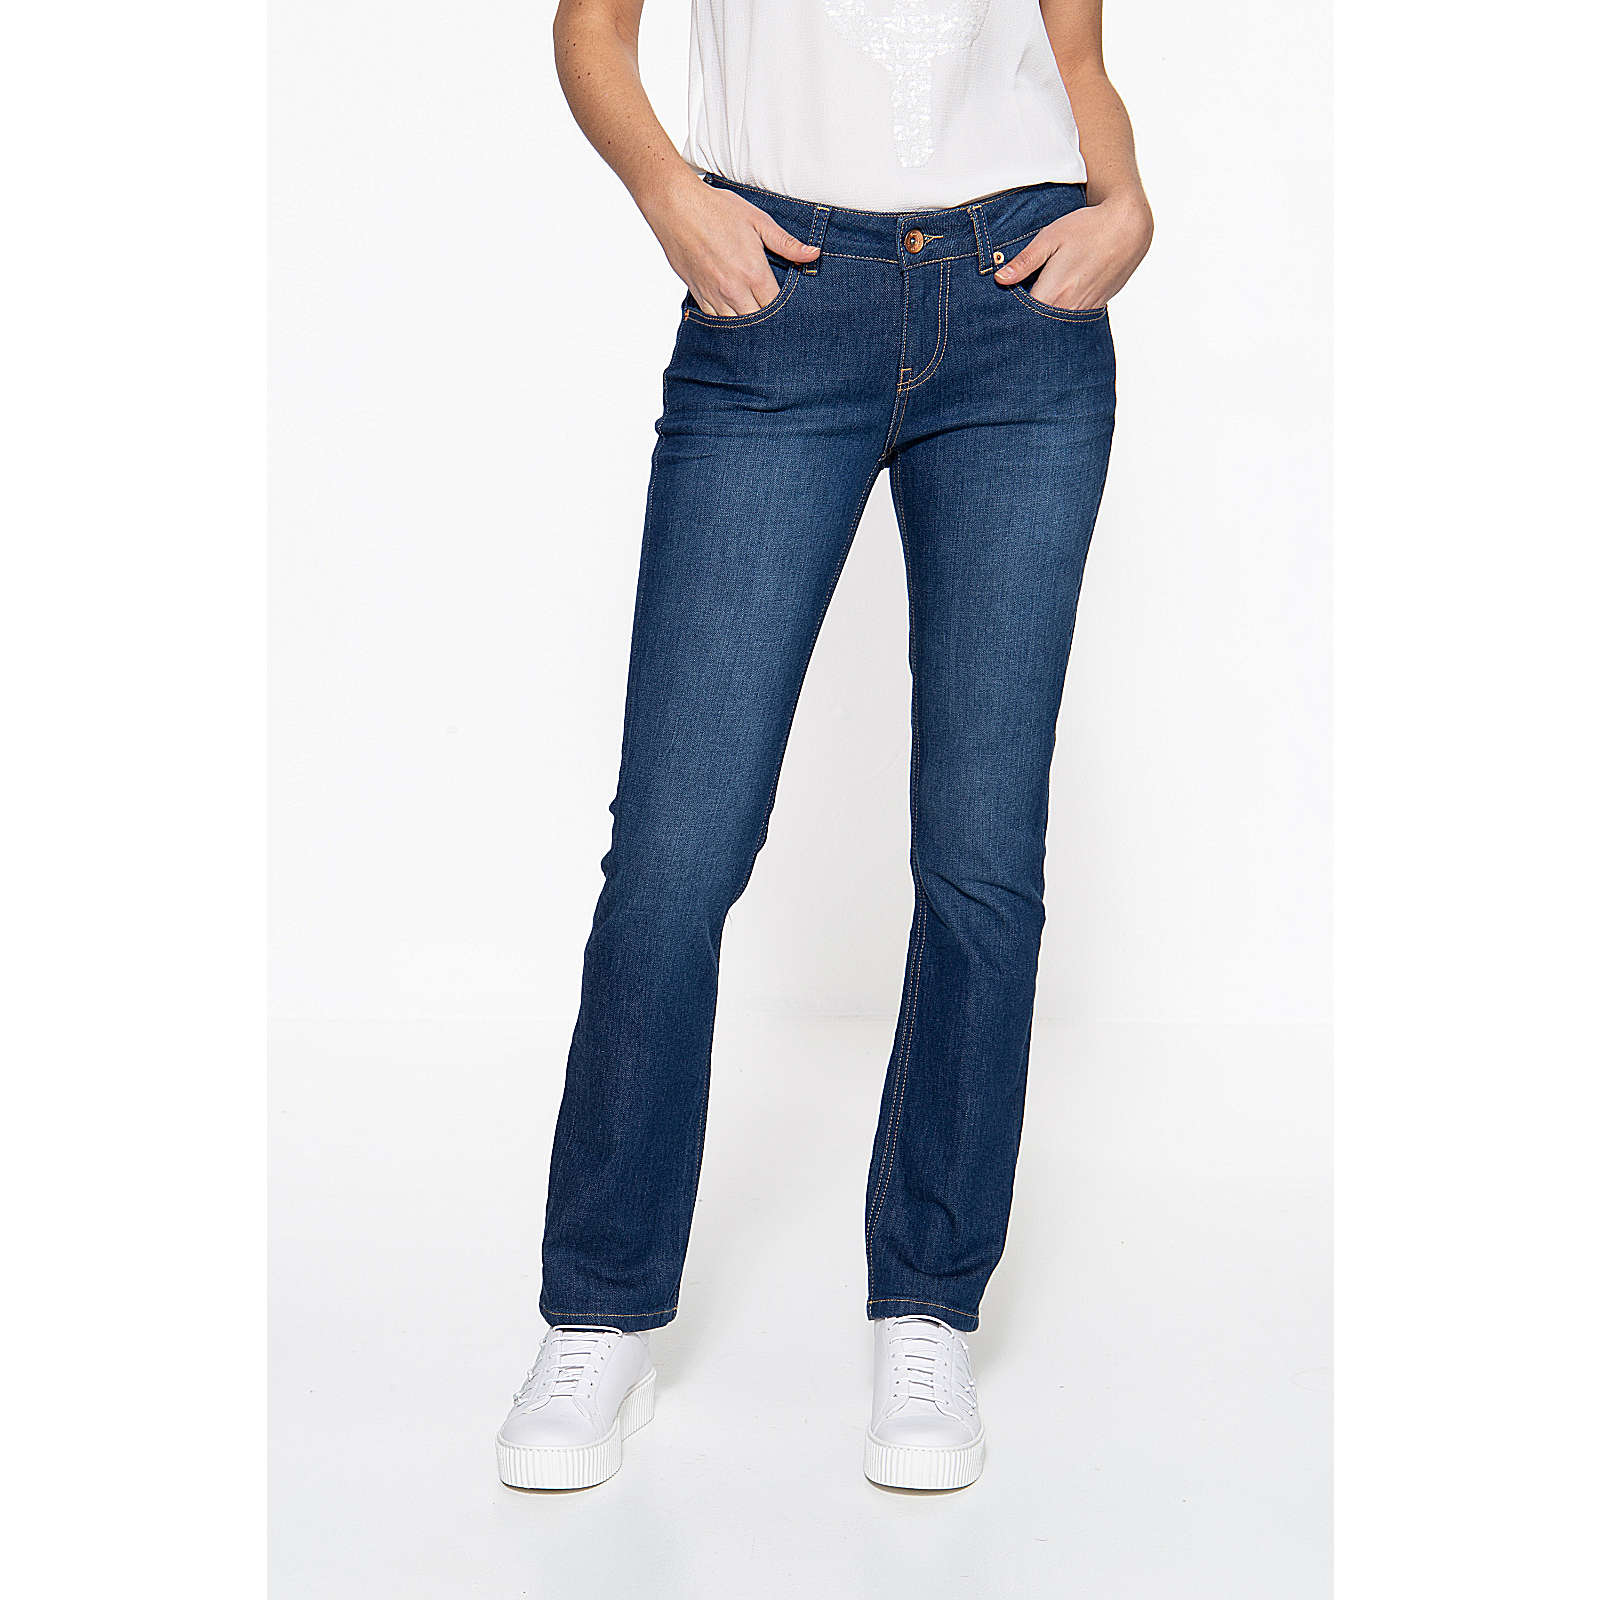 ATT Jeans Straight Cut Jeans »Stella« mit Kontraststeppungen Stella Jeanshosen dunkelblau Damen Gr. W34/L34